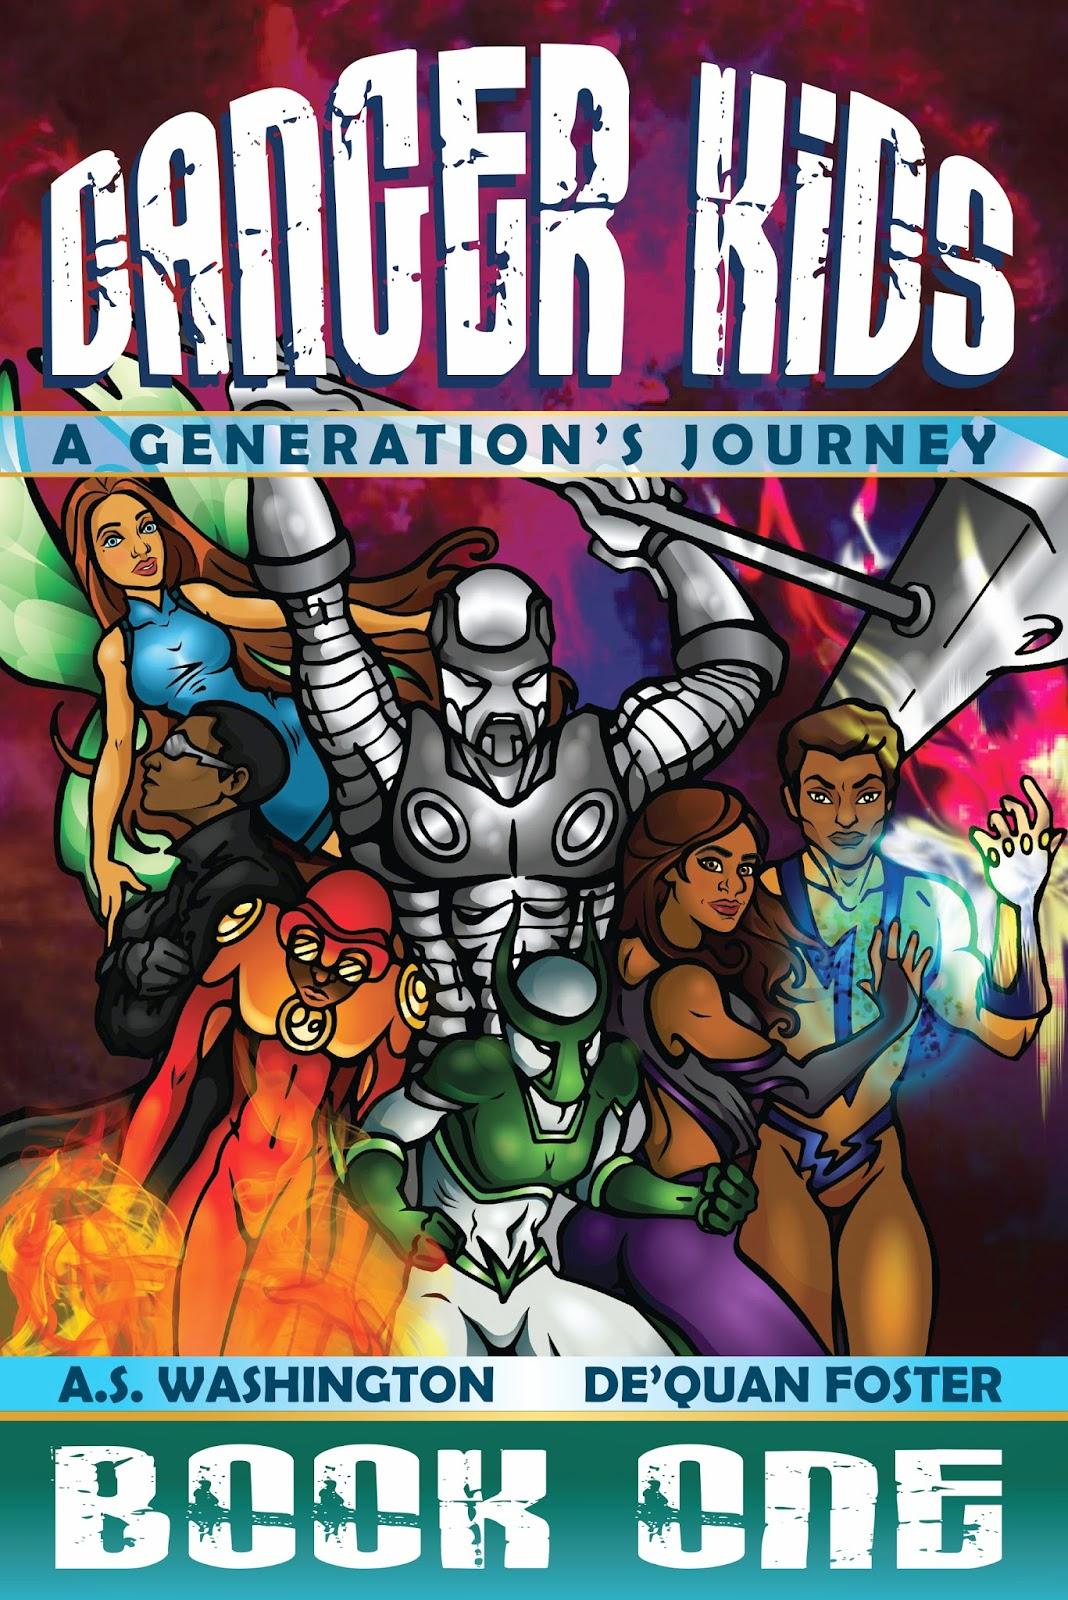 http://www.amazon.com/A-Generations-Journey-Danger-Kids-ebook/dp/B00K7U9I5G/ref=sr_1_1?ie=UTF8&qid=1399990803&sr=8-1&keywords=A+Generation%27s+Journey+A.S.+Washington